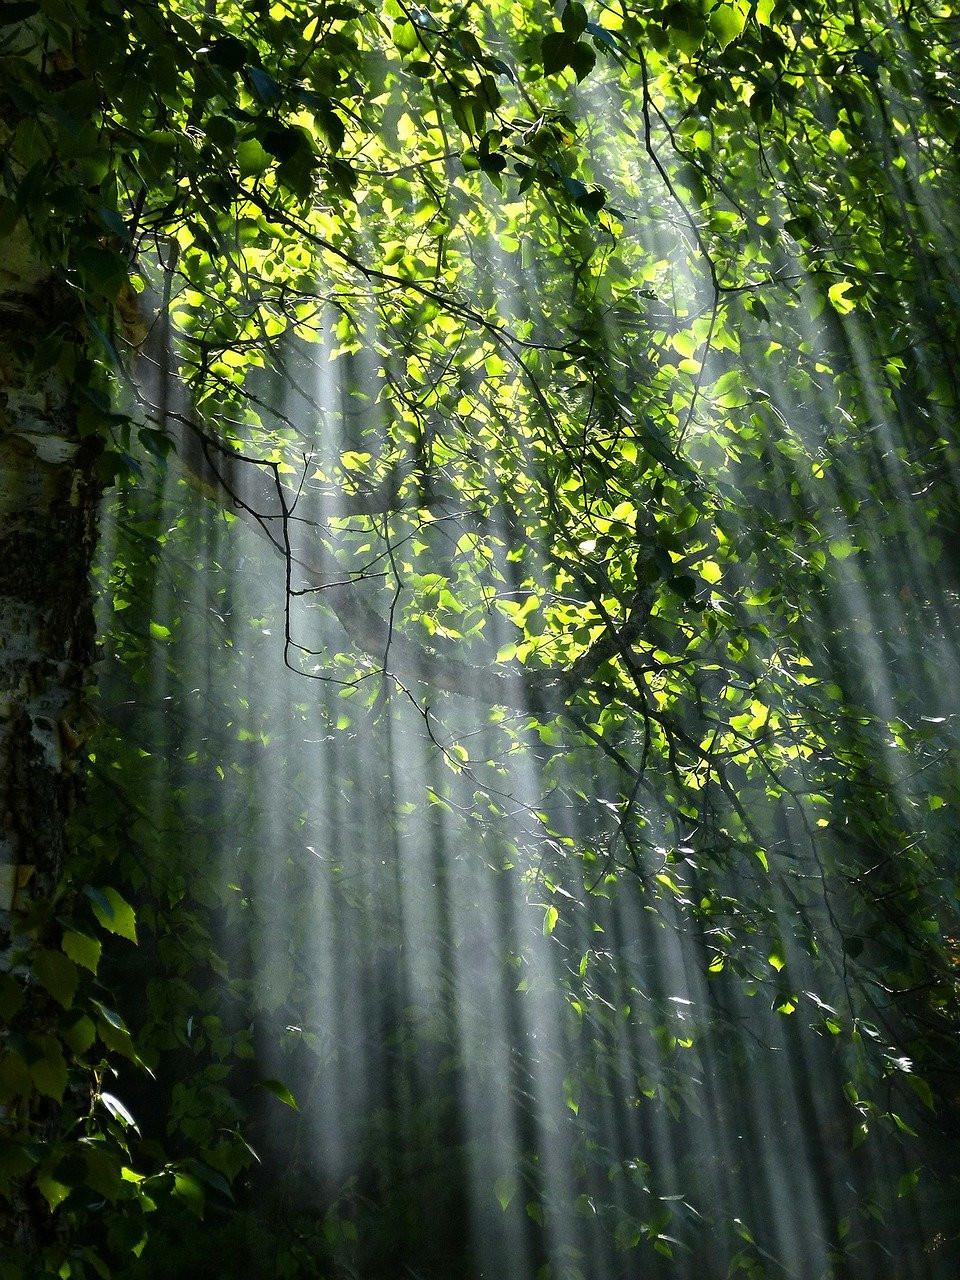 sunlight flooding through forest canopy